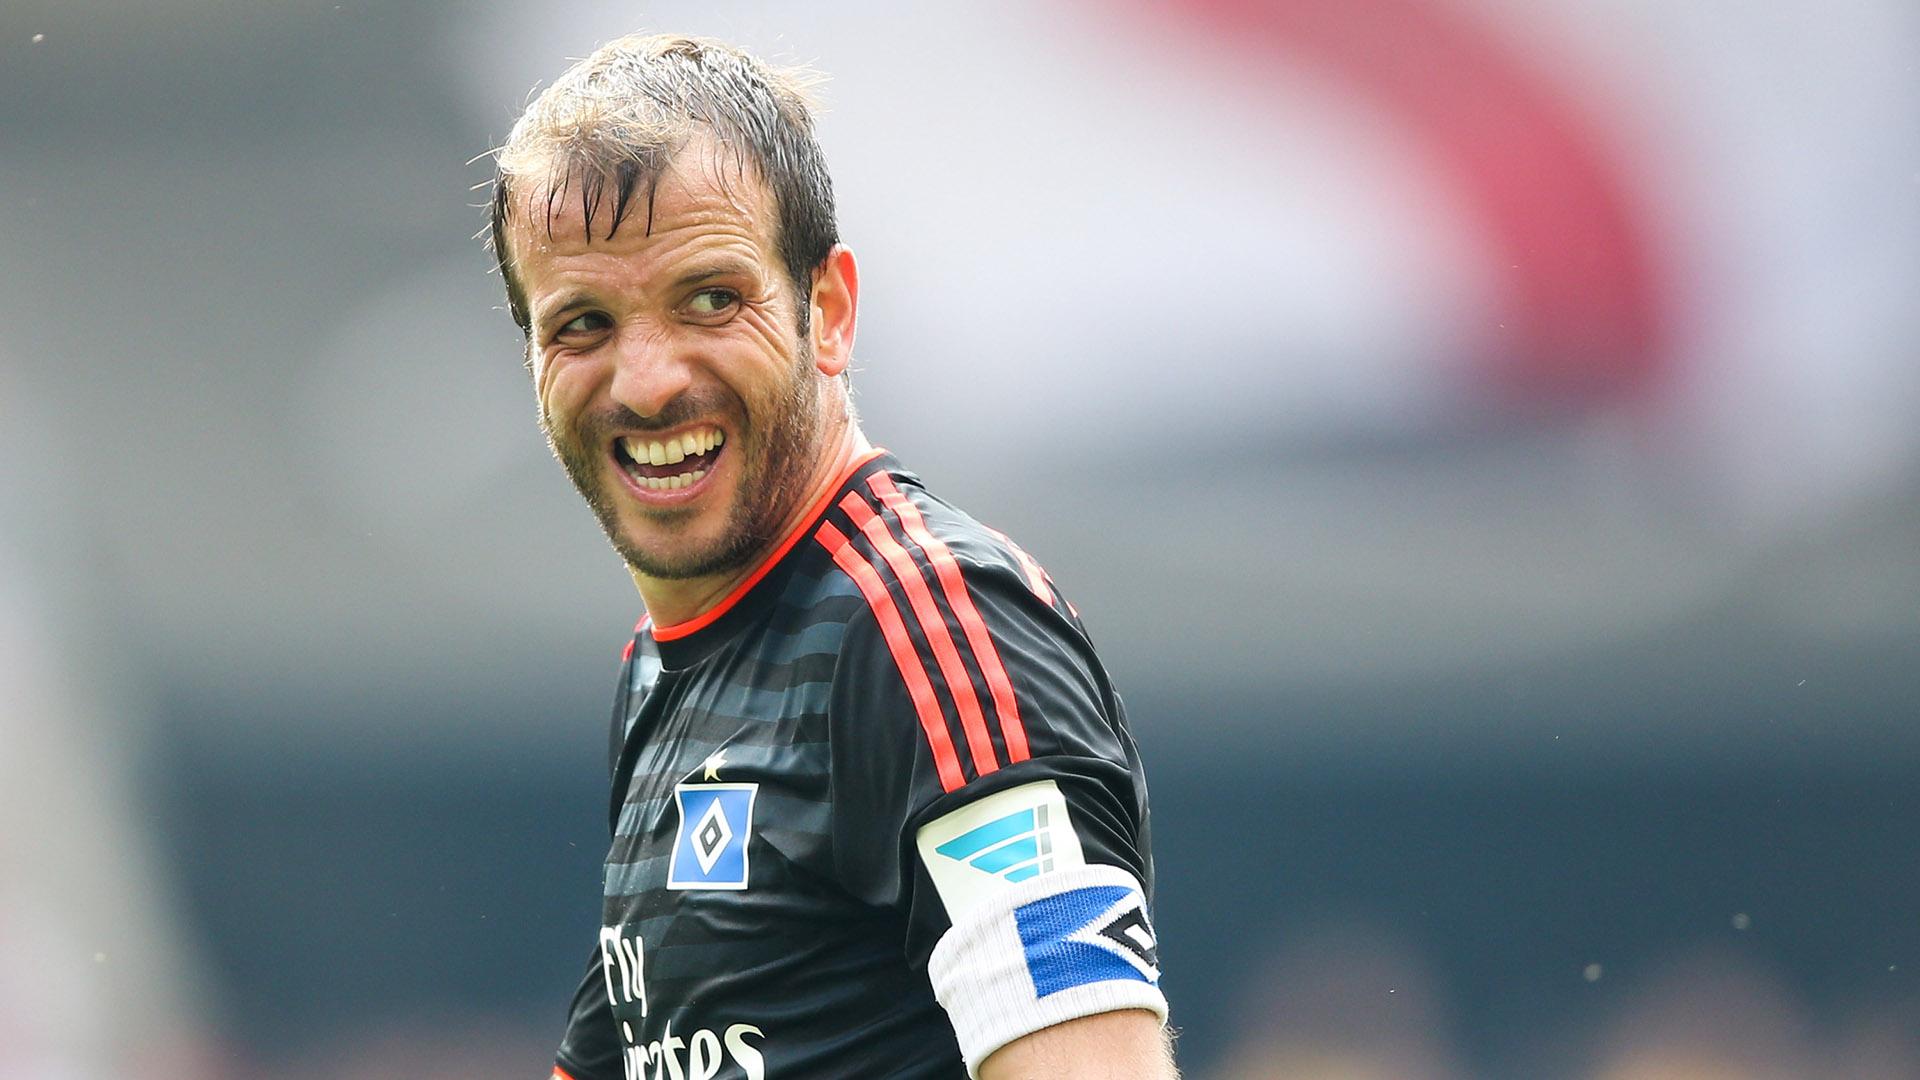 Rafael van der Vaart met un terme à sa carrière — Pays-Bas